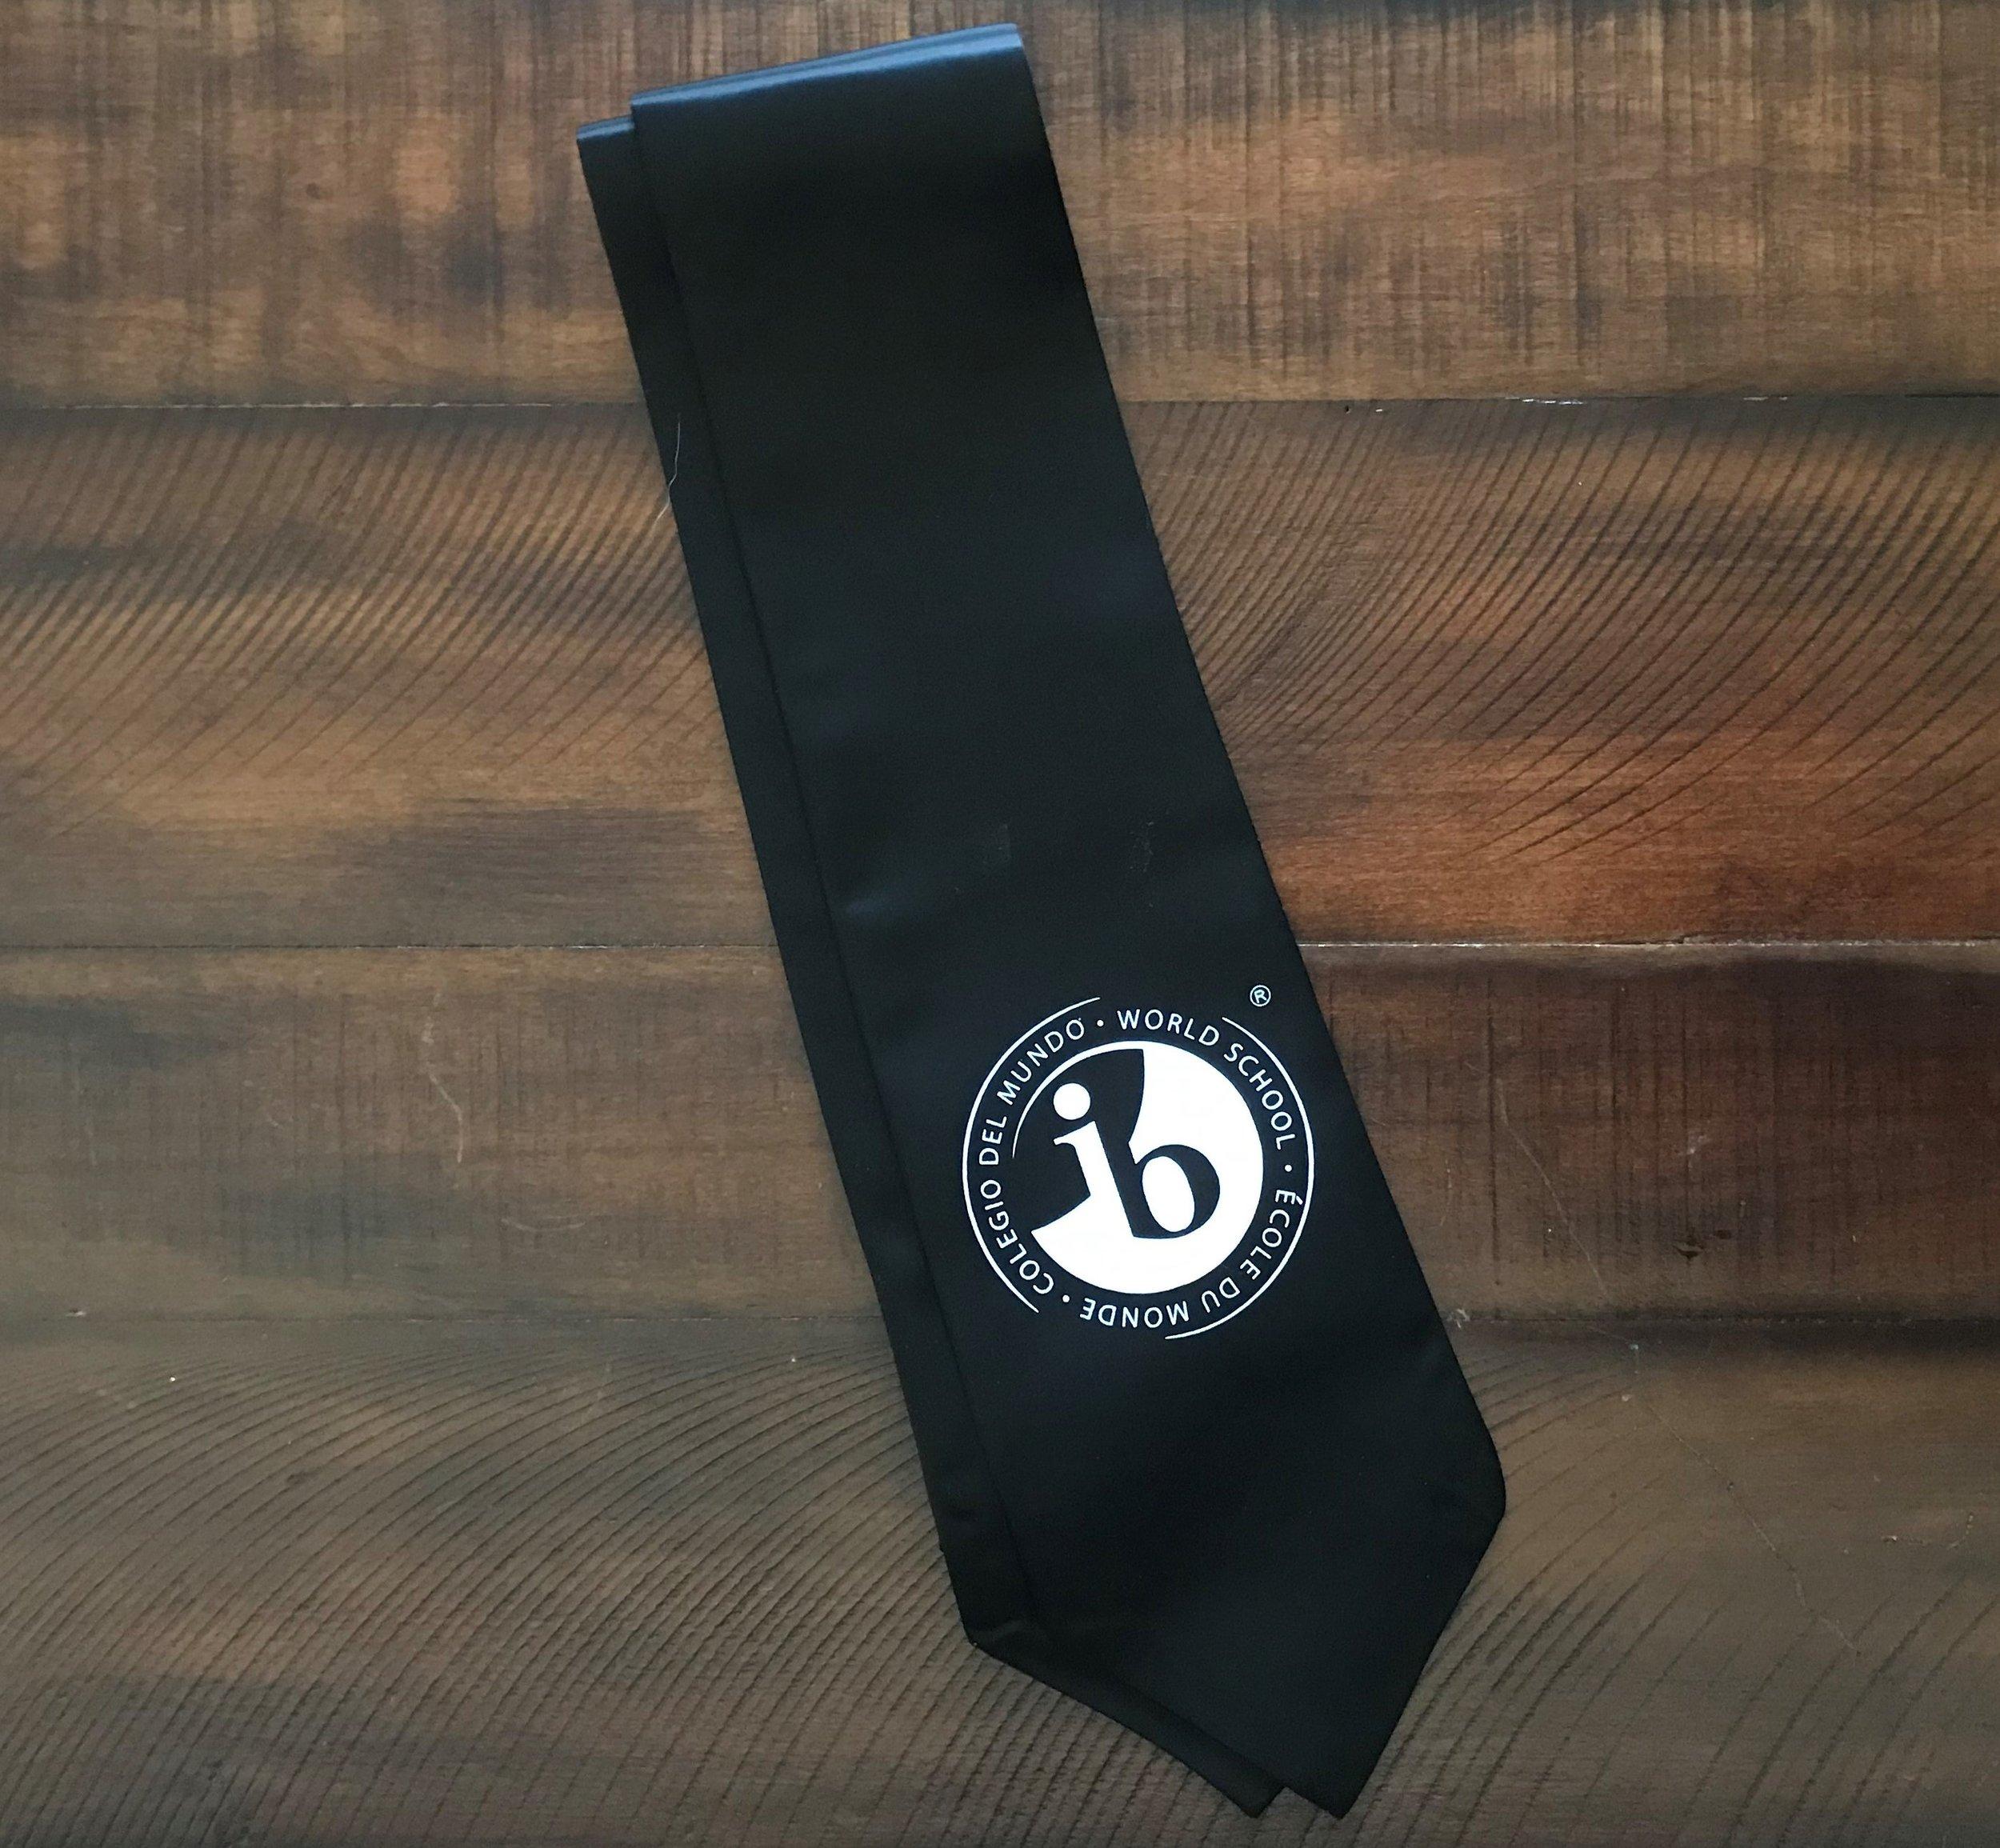 IB Stole - black with white imprinted 'IB' logo